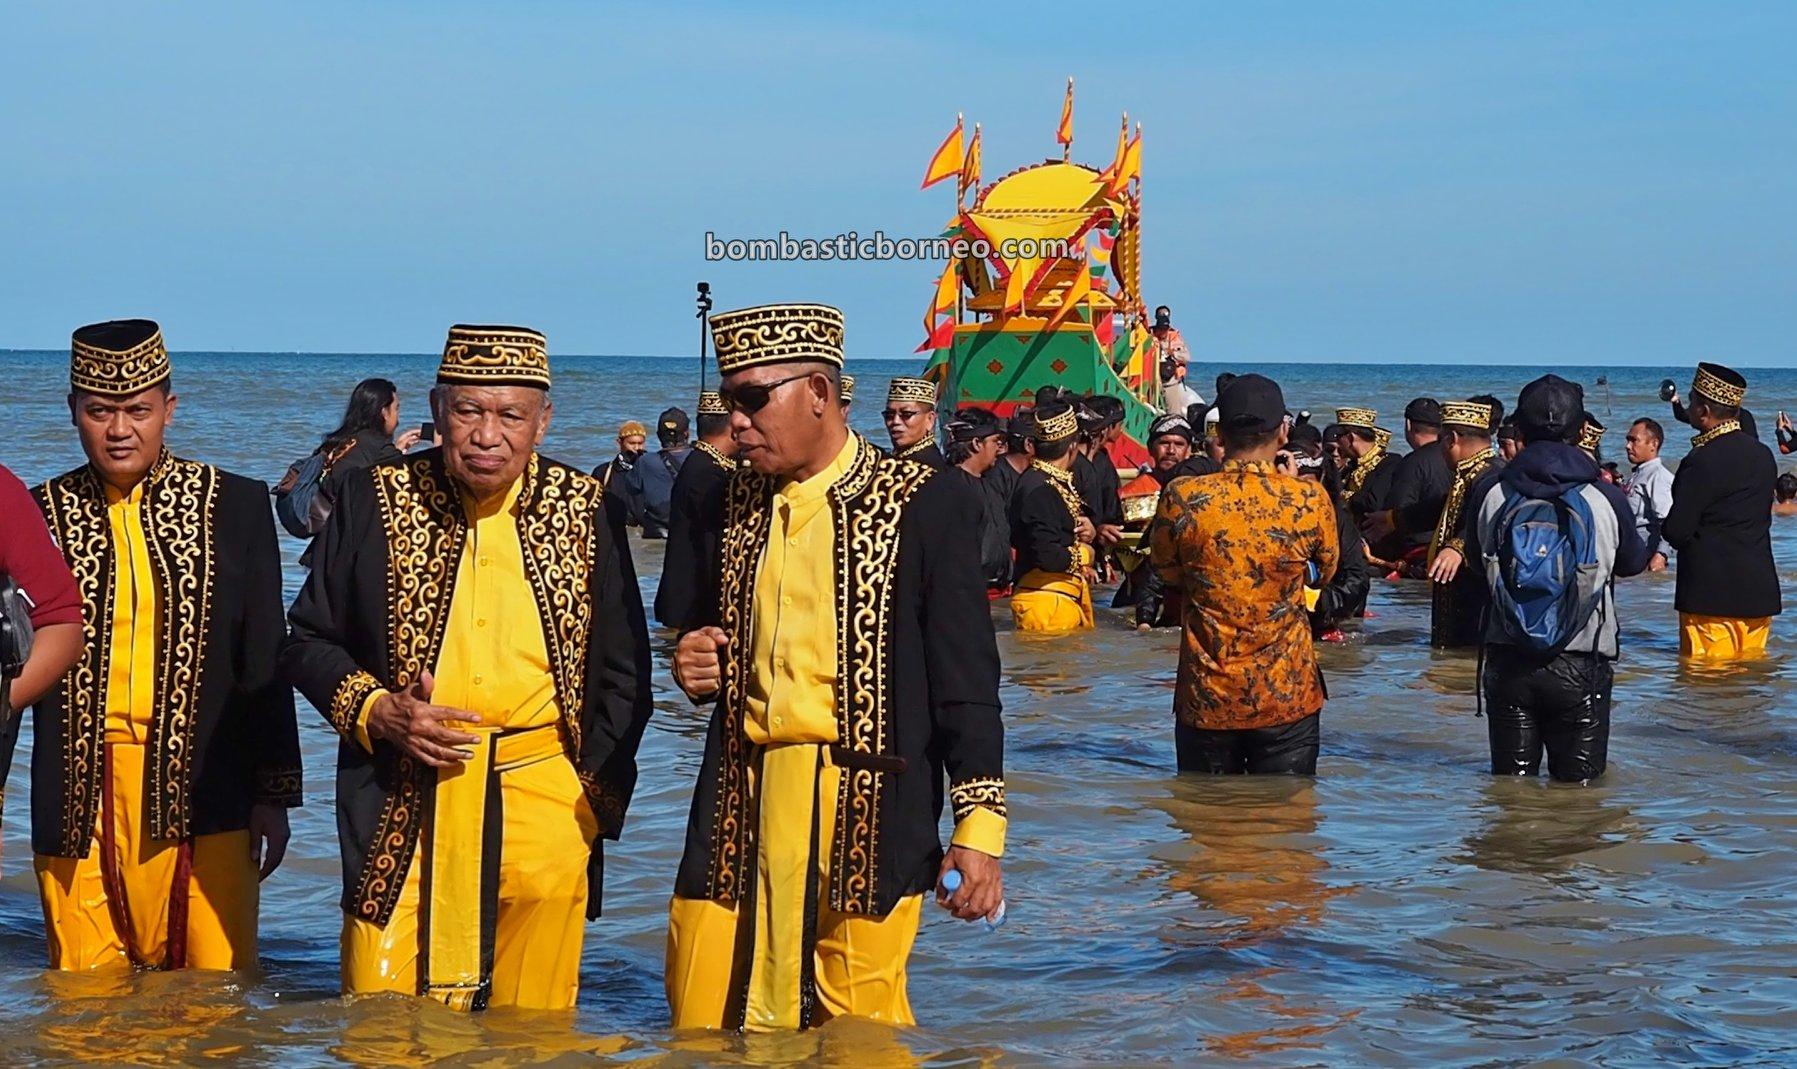 Padaw Tuju Dulung boat, Festival Iraw Tengkayu, upacara adat, event, Ethnic, native, tribal, Tarakan, North Kalimantan, wisata budaya, tourist attraction, Trans Borneo, 穿越婆罗洲印尼, 北加里曼丹旅游景点, 打拉根原住民传统文化